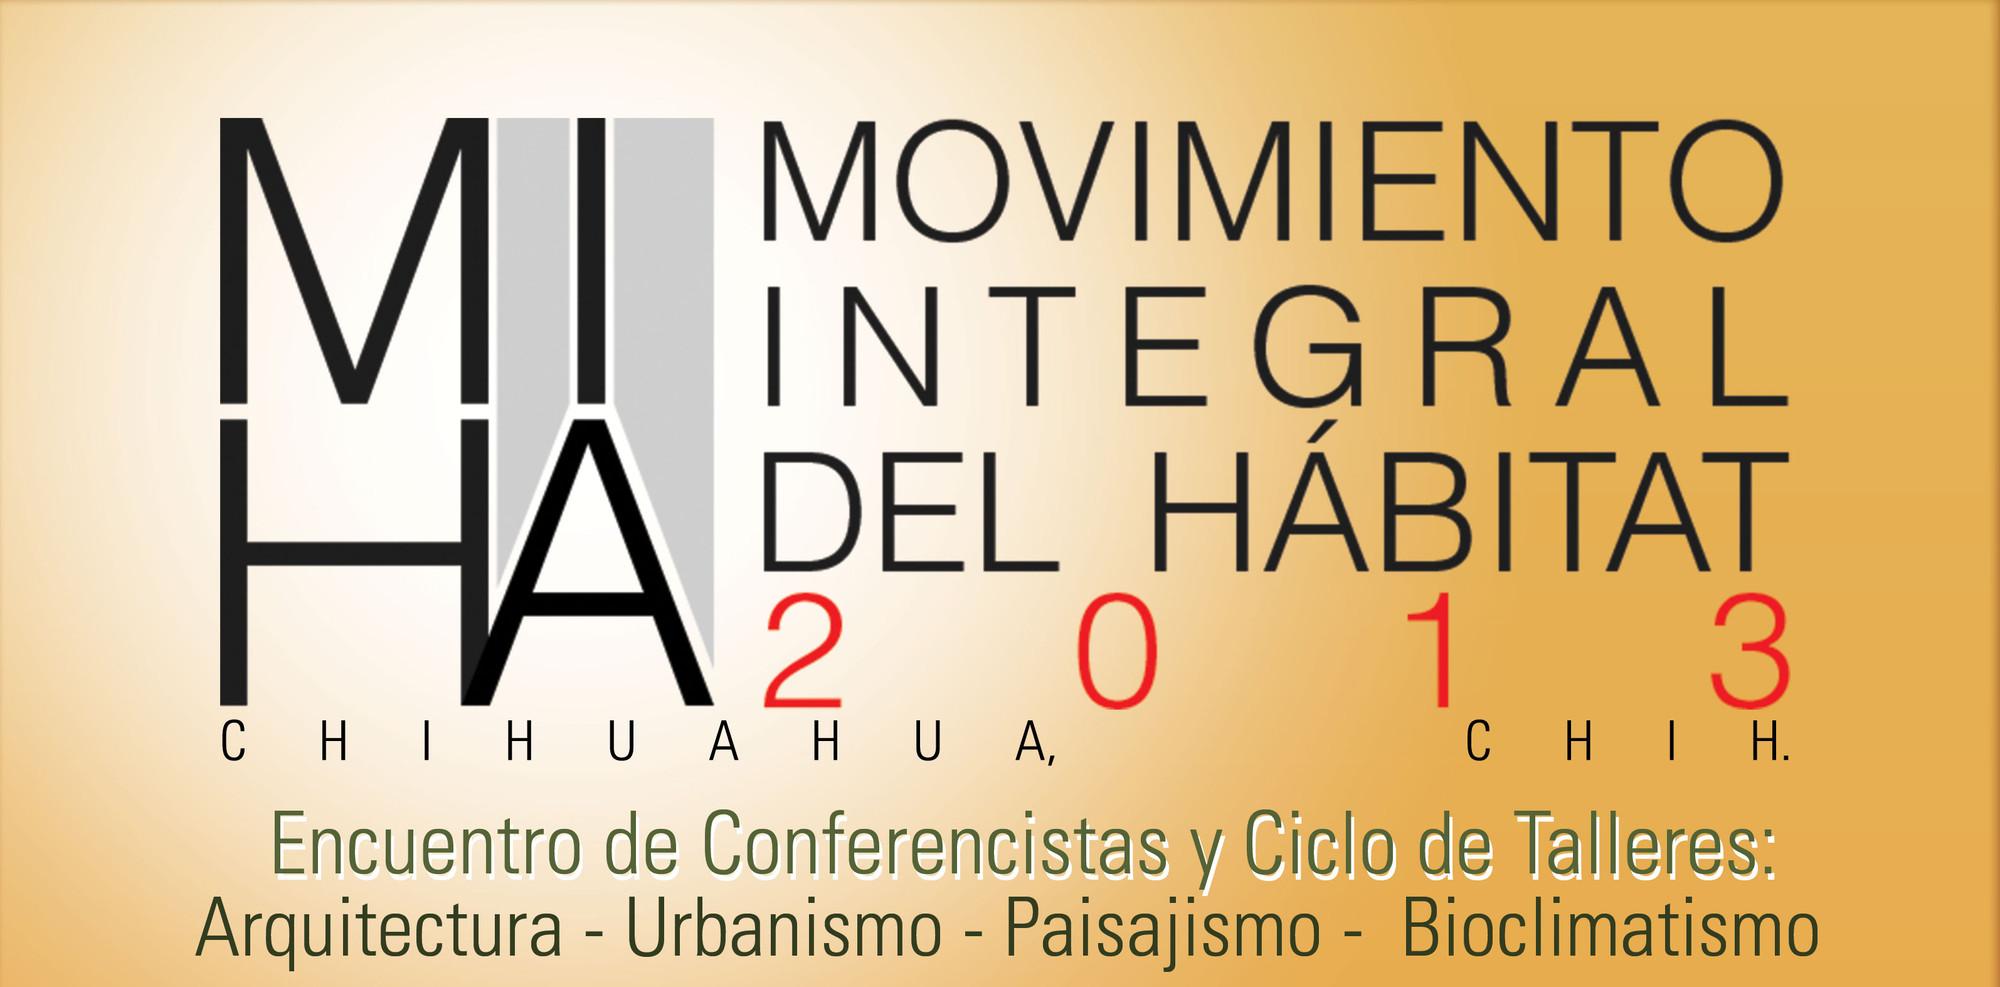 Movimiento Integral del Habitat /  MIHA 2013